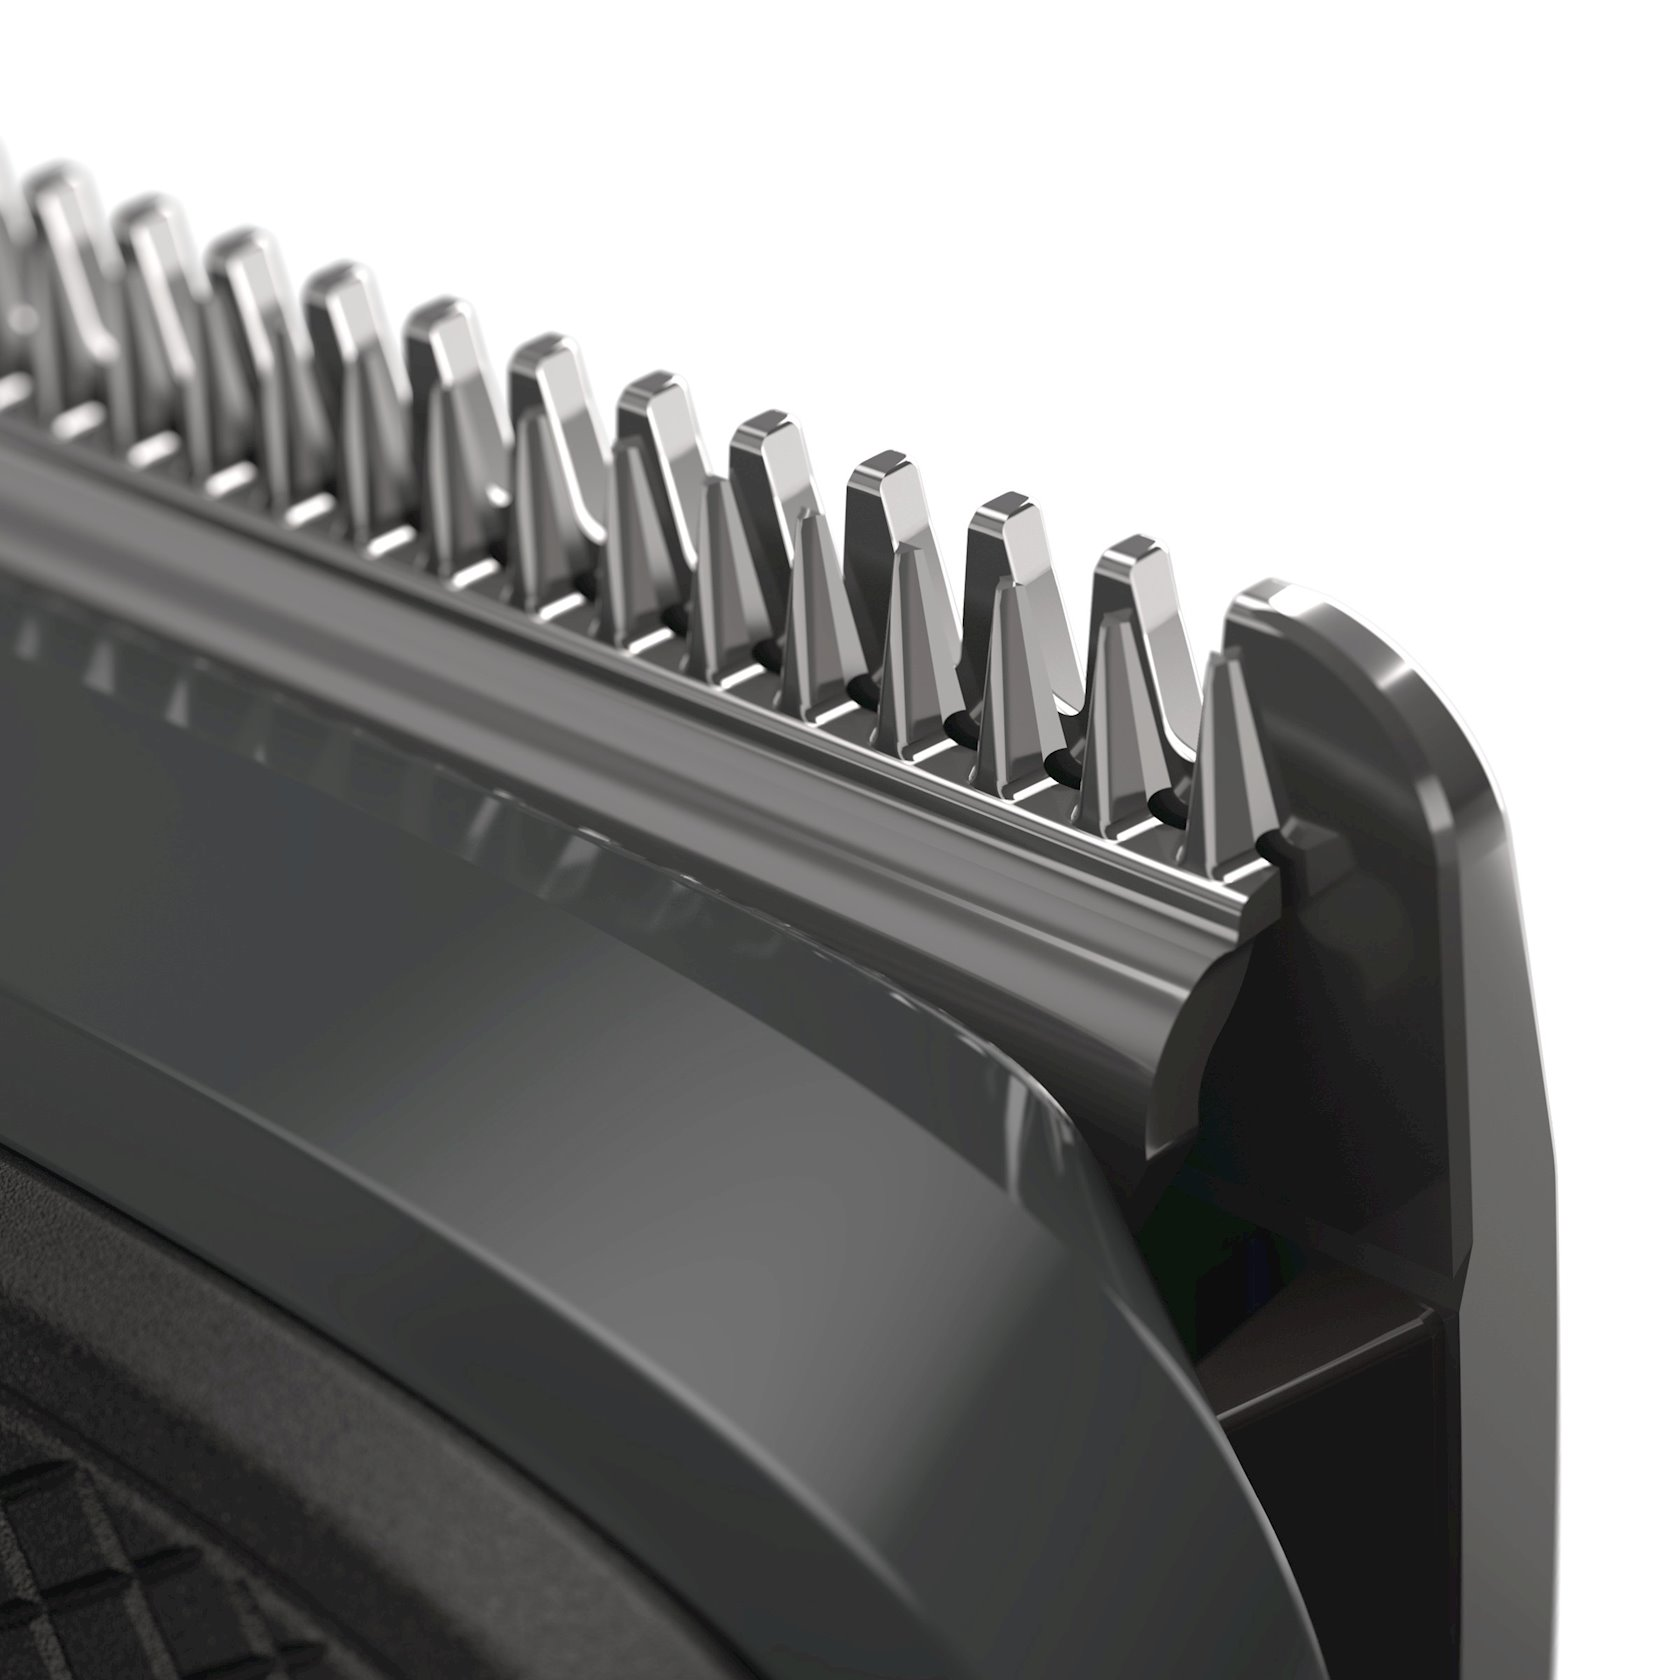 Trimmer Philips 11-i 1-də Series 5000 MG5730/15